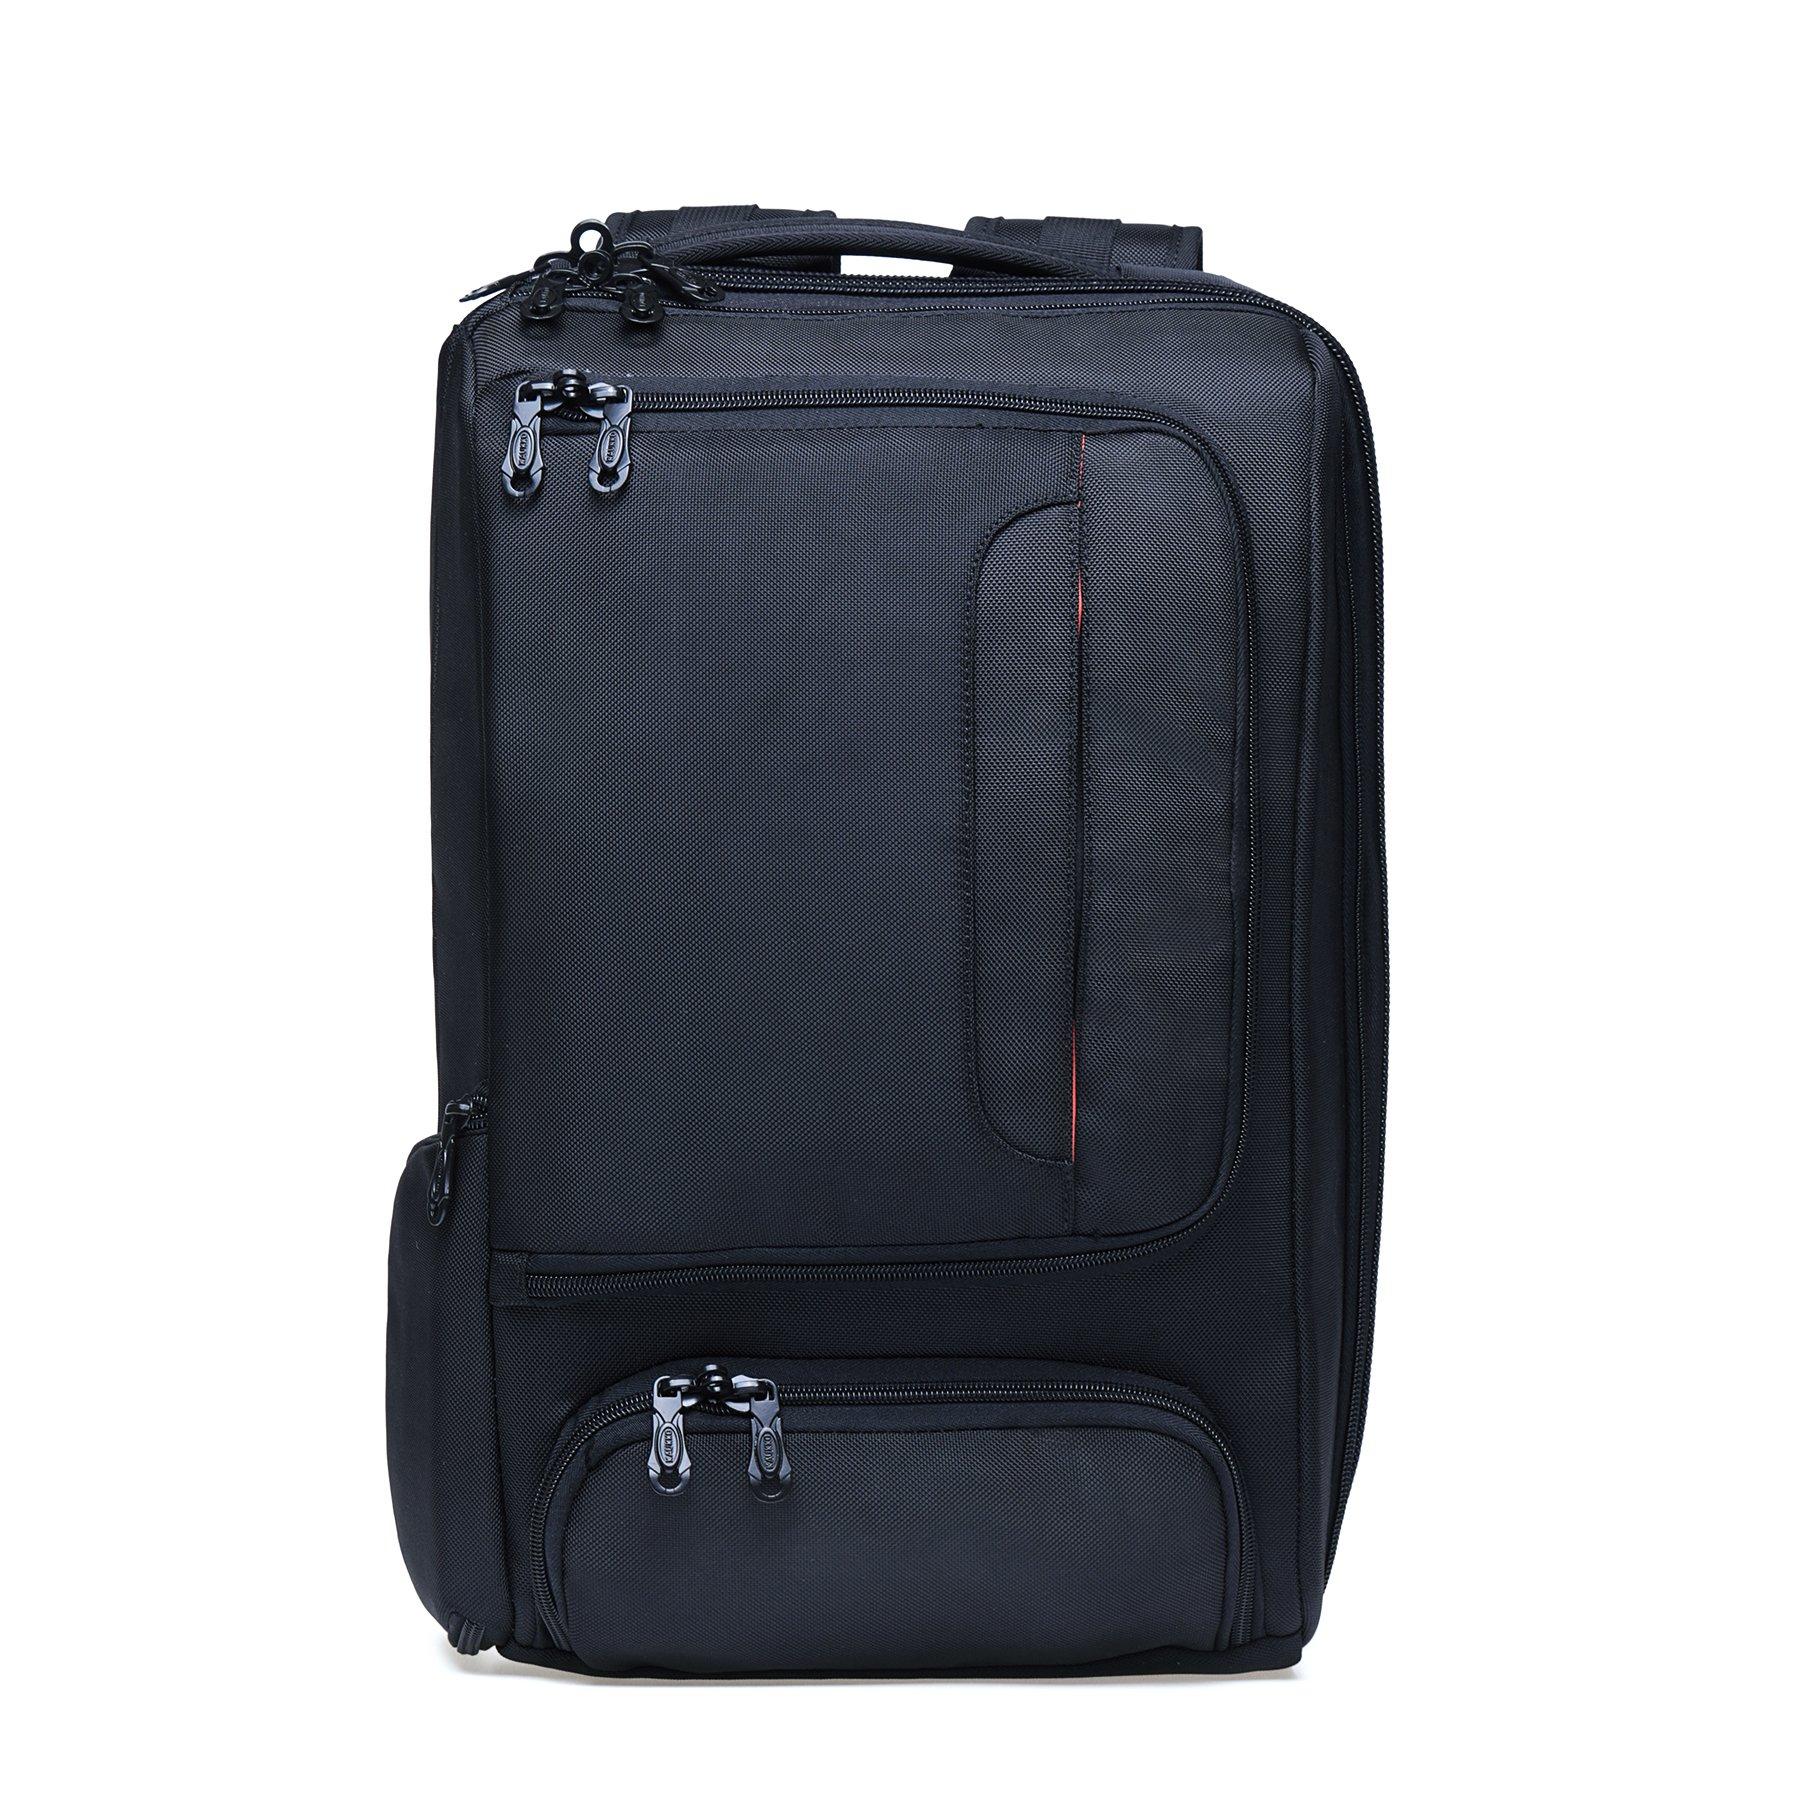 KAUKKO Laptop Outdoor Backpack, Travel Hiking& Camping Rucksack Pack, Casual Large College School Daypack, Shoulder Book Bags Back Fits 15'' Laptop & Tablets (4Black) by KAUKKO (Image #3)